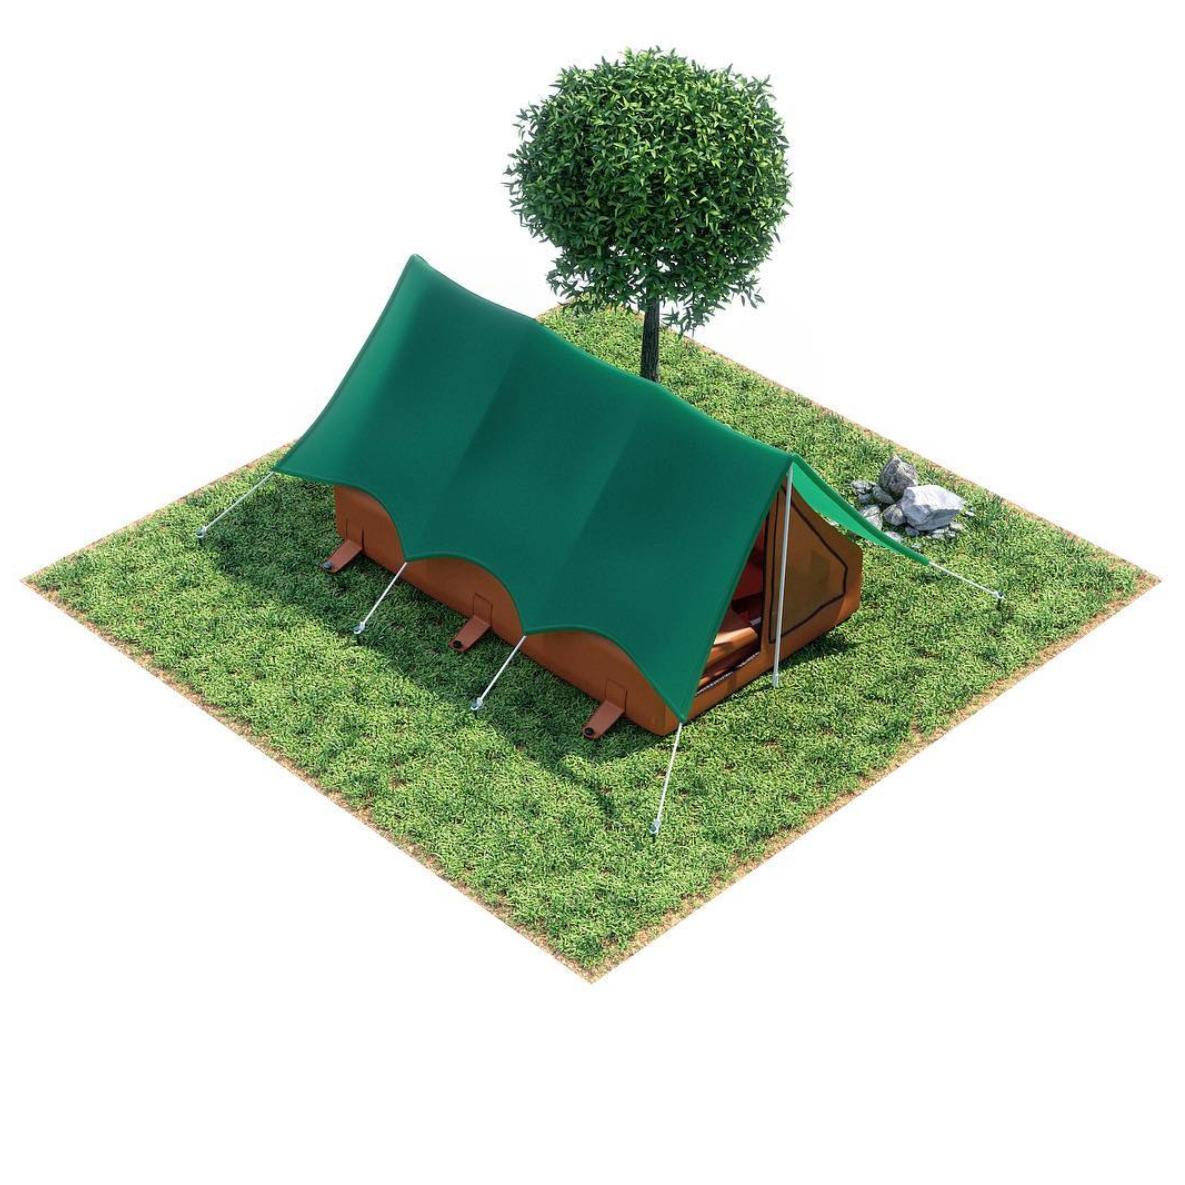 Game_Assets_3D_Tent_FStorm